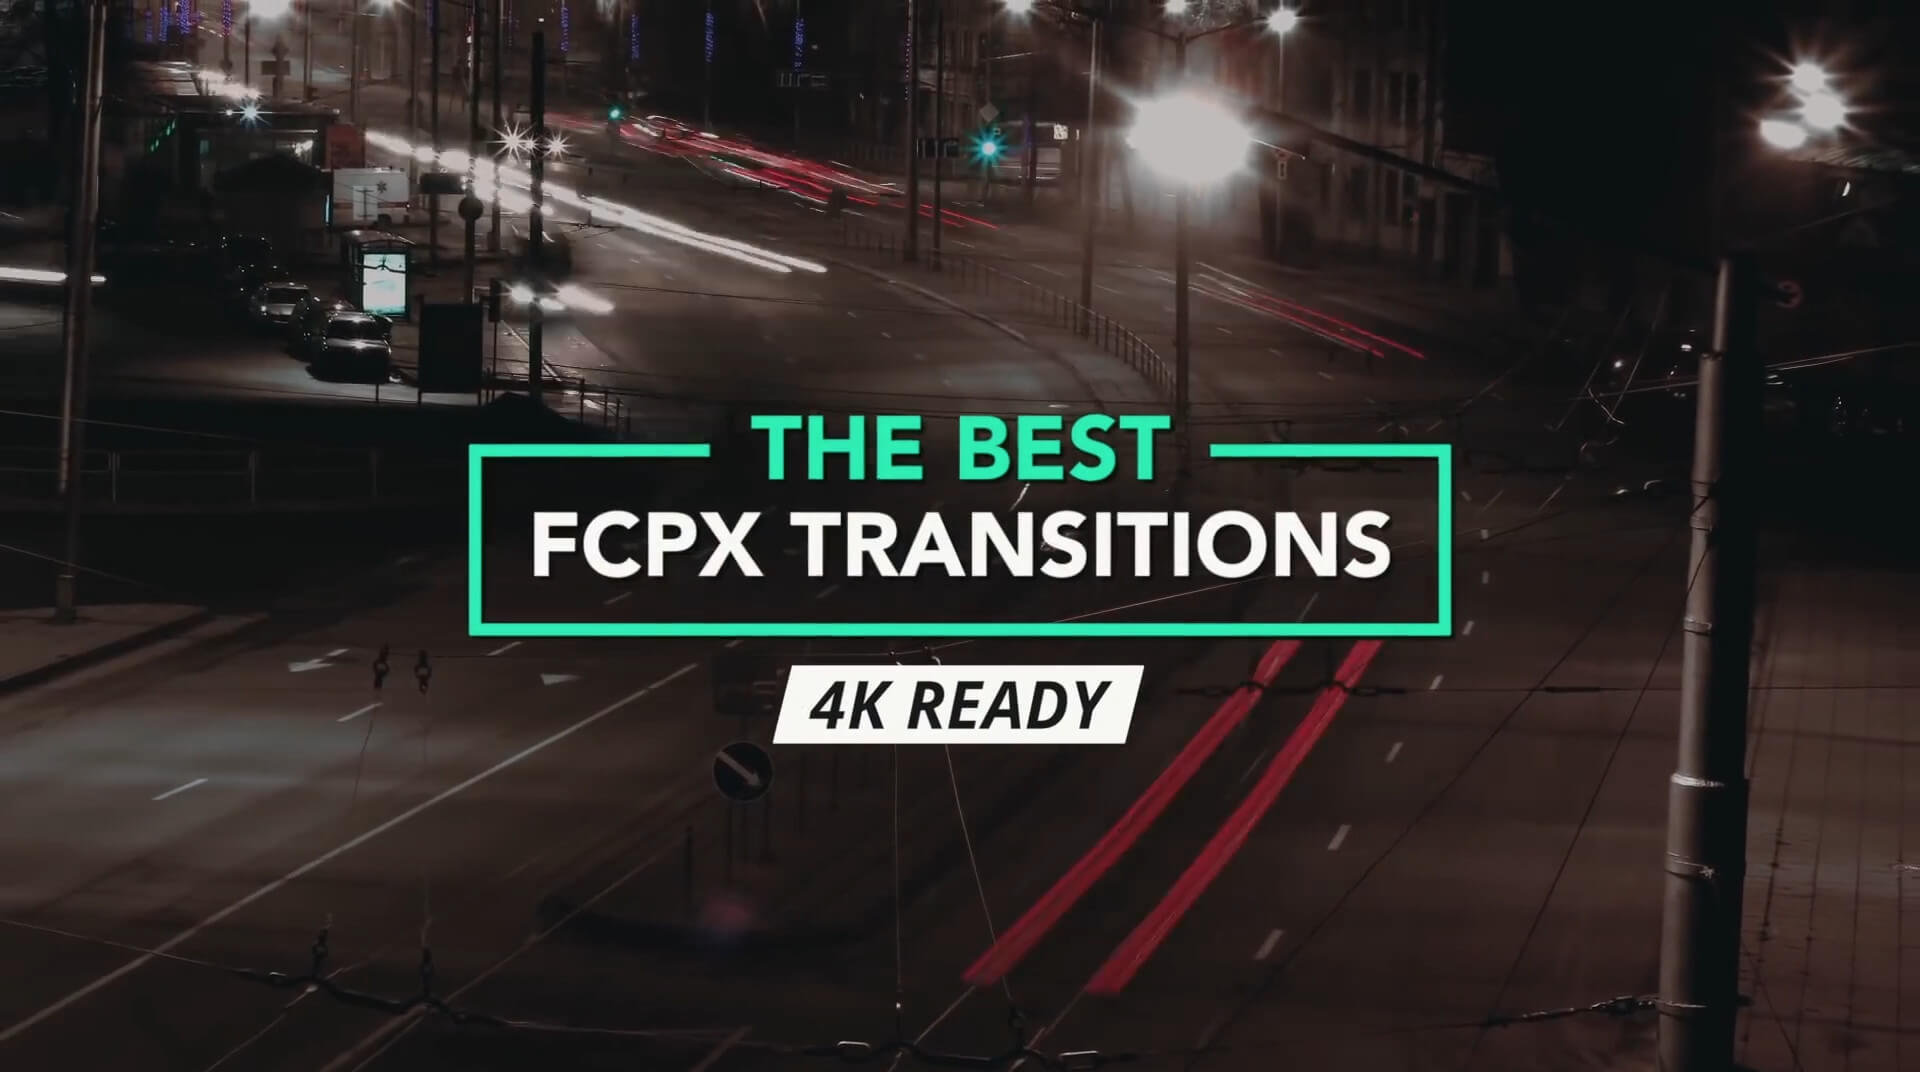 Fcpx转场插件 30组现代流行光速过渡转场 Vlog常用转场集合 支持手机竖屏